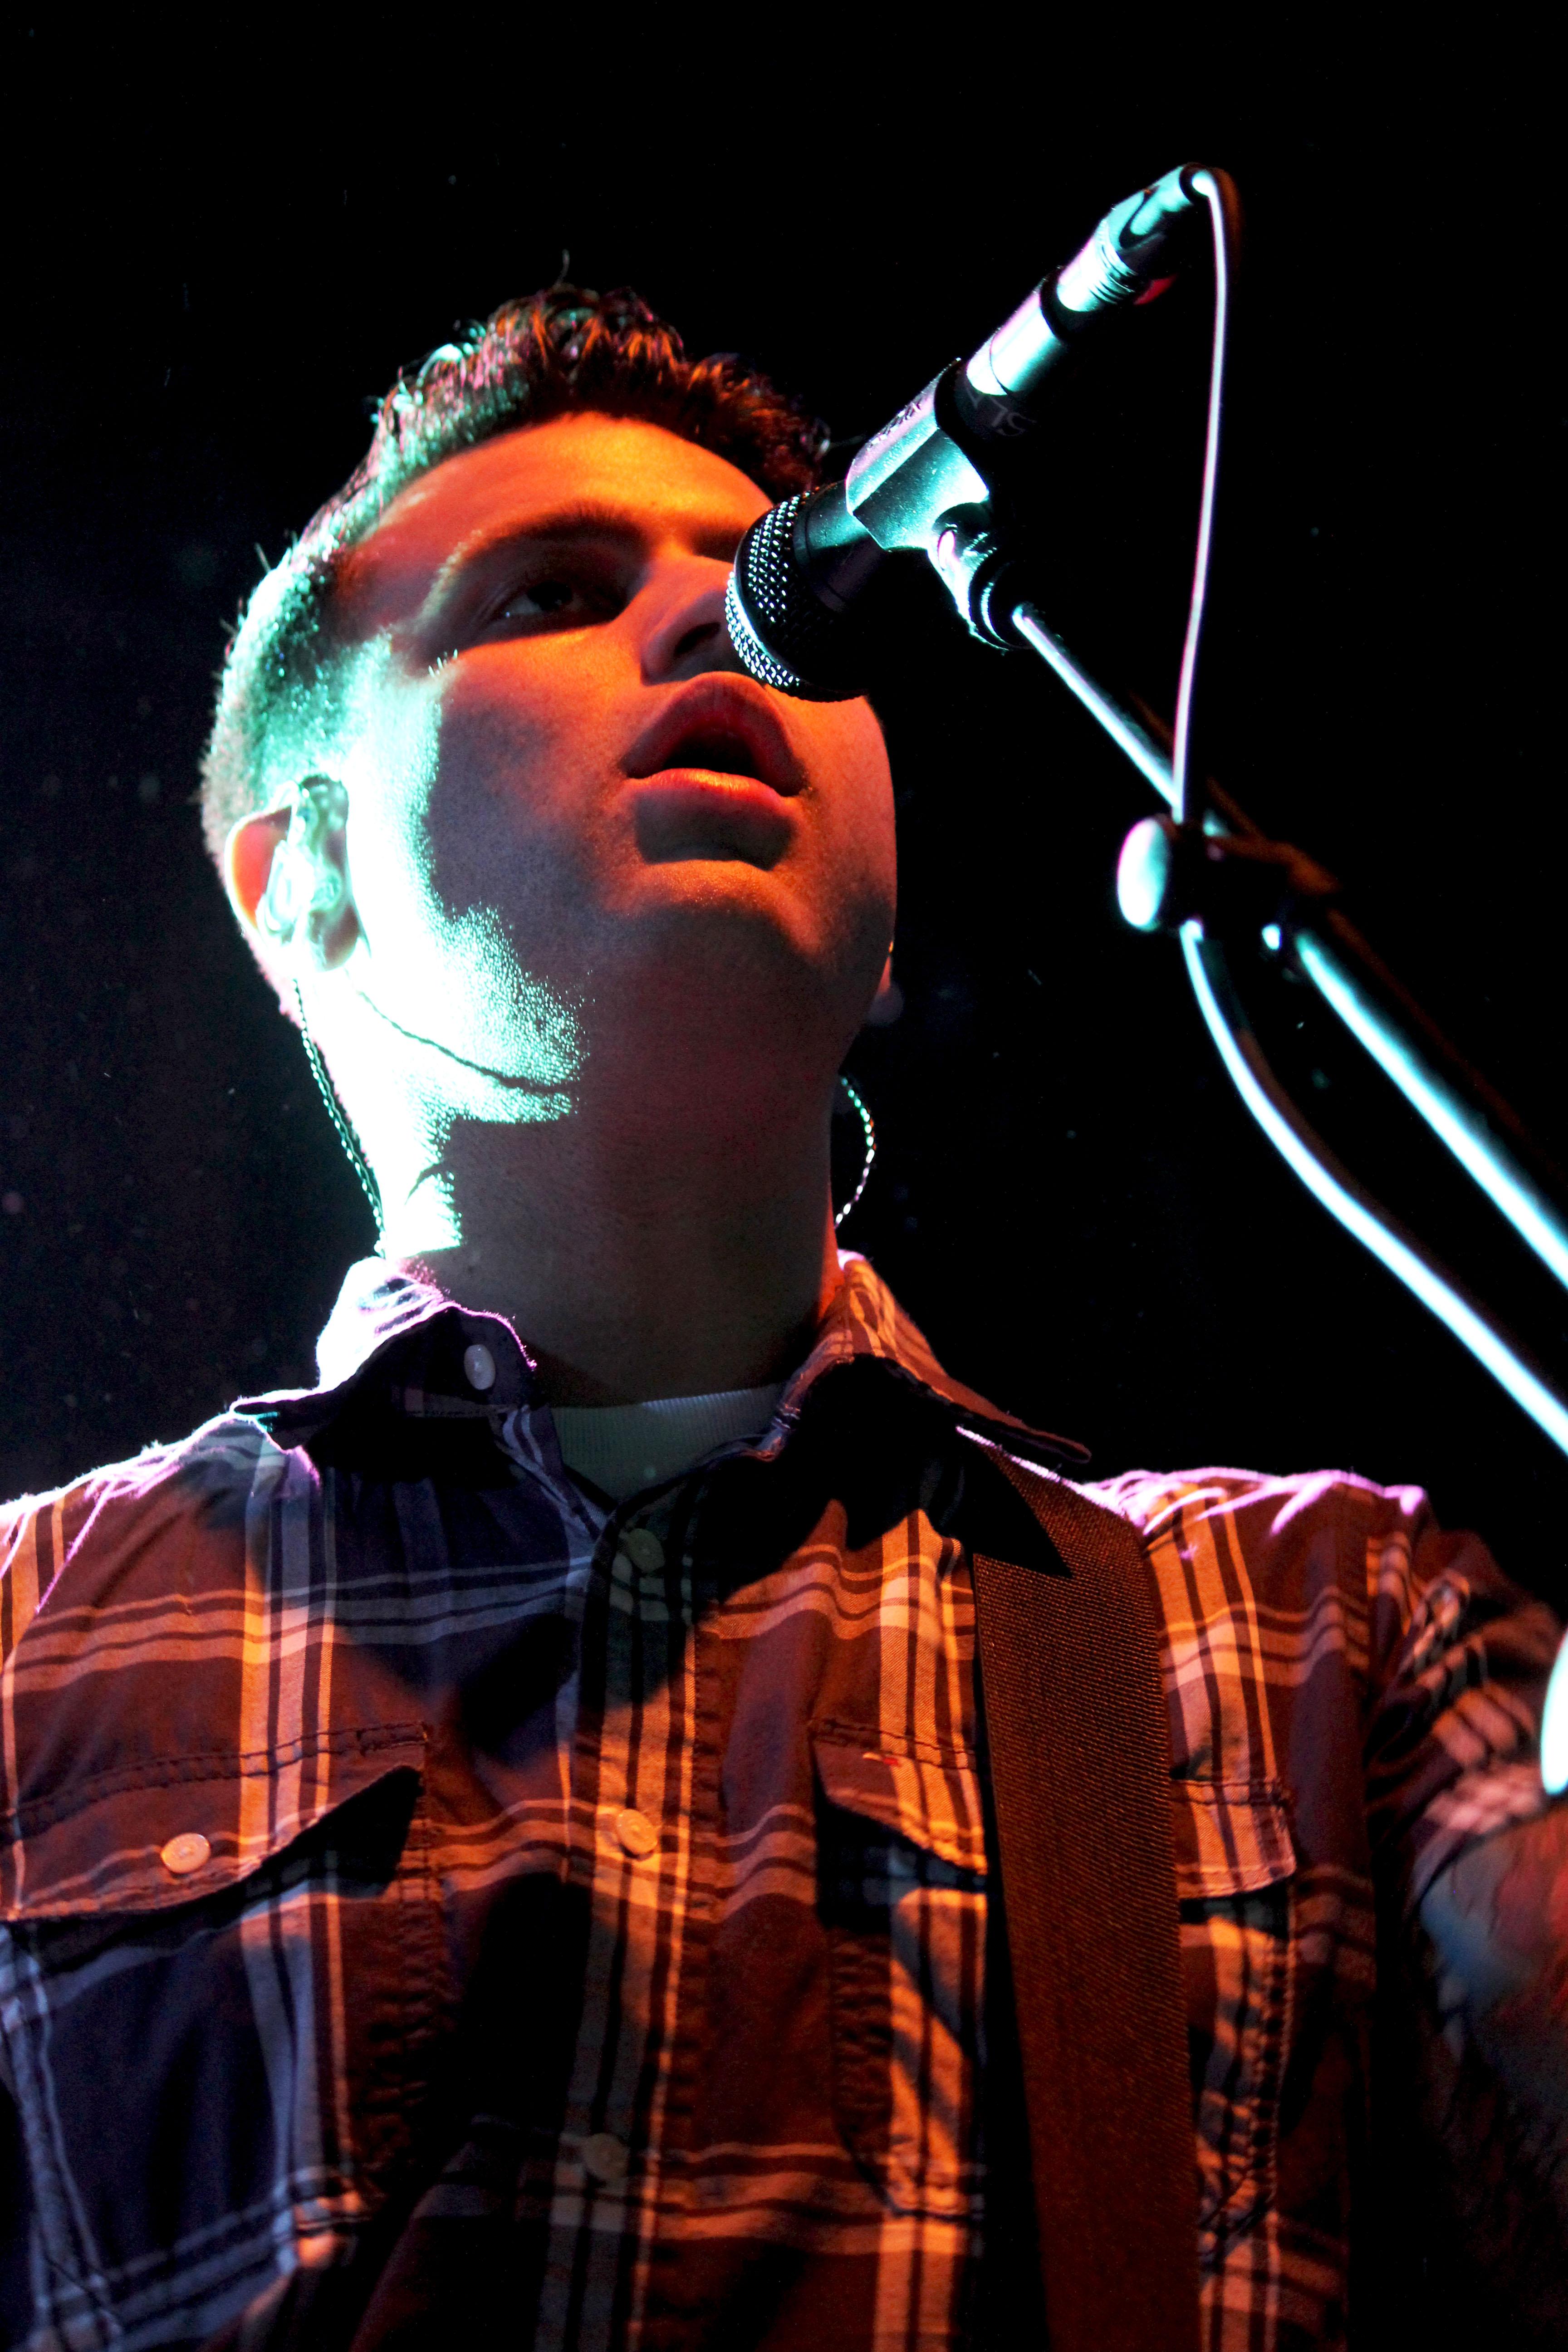 Alex Levine (The Gaslight Anthem)